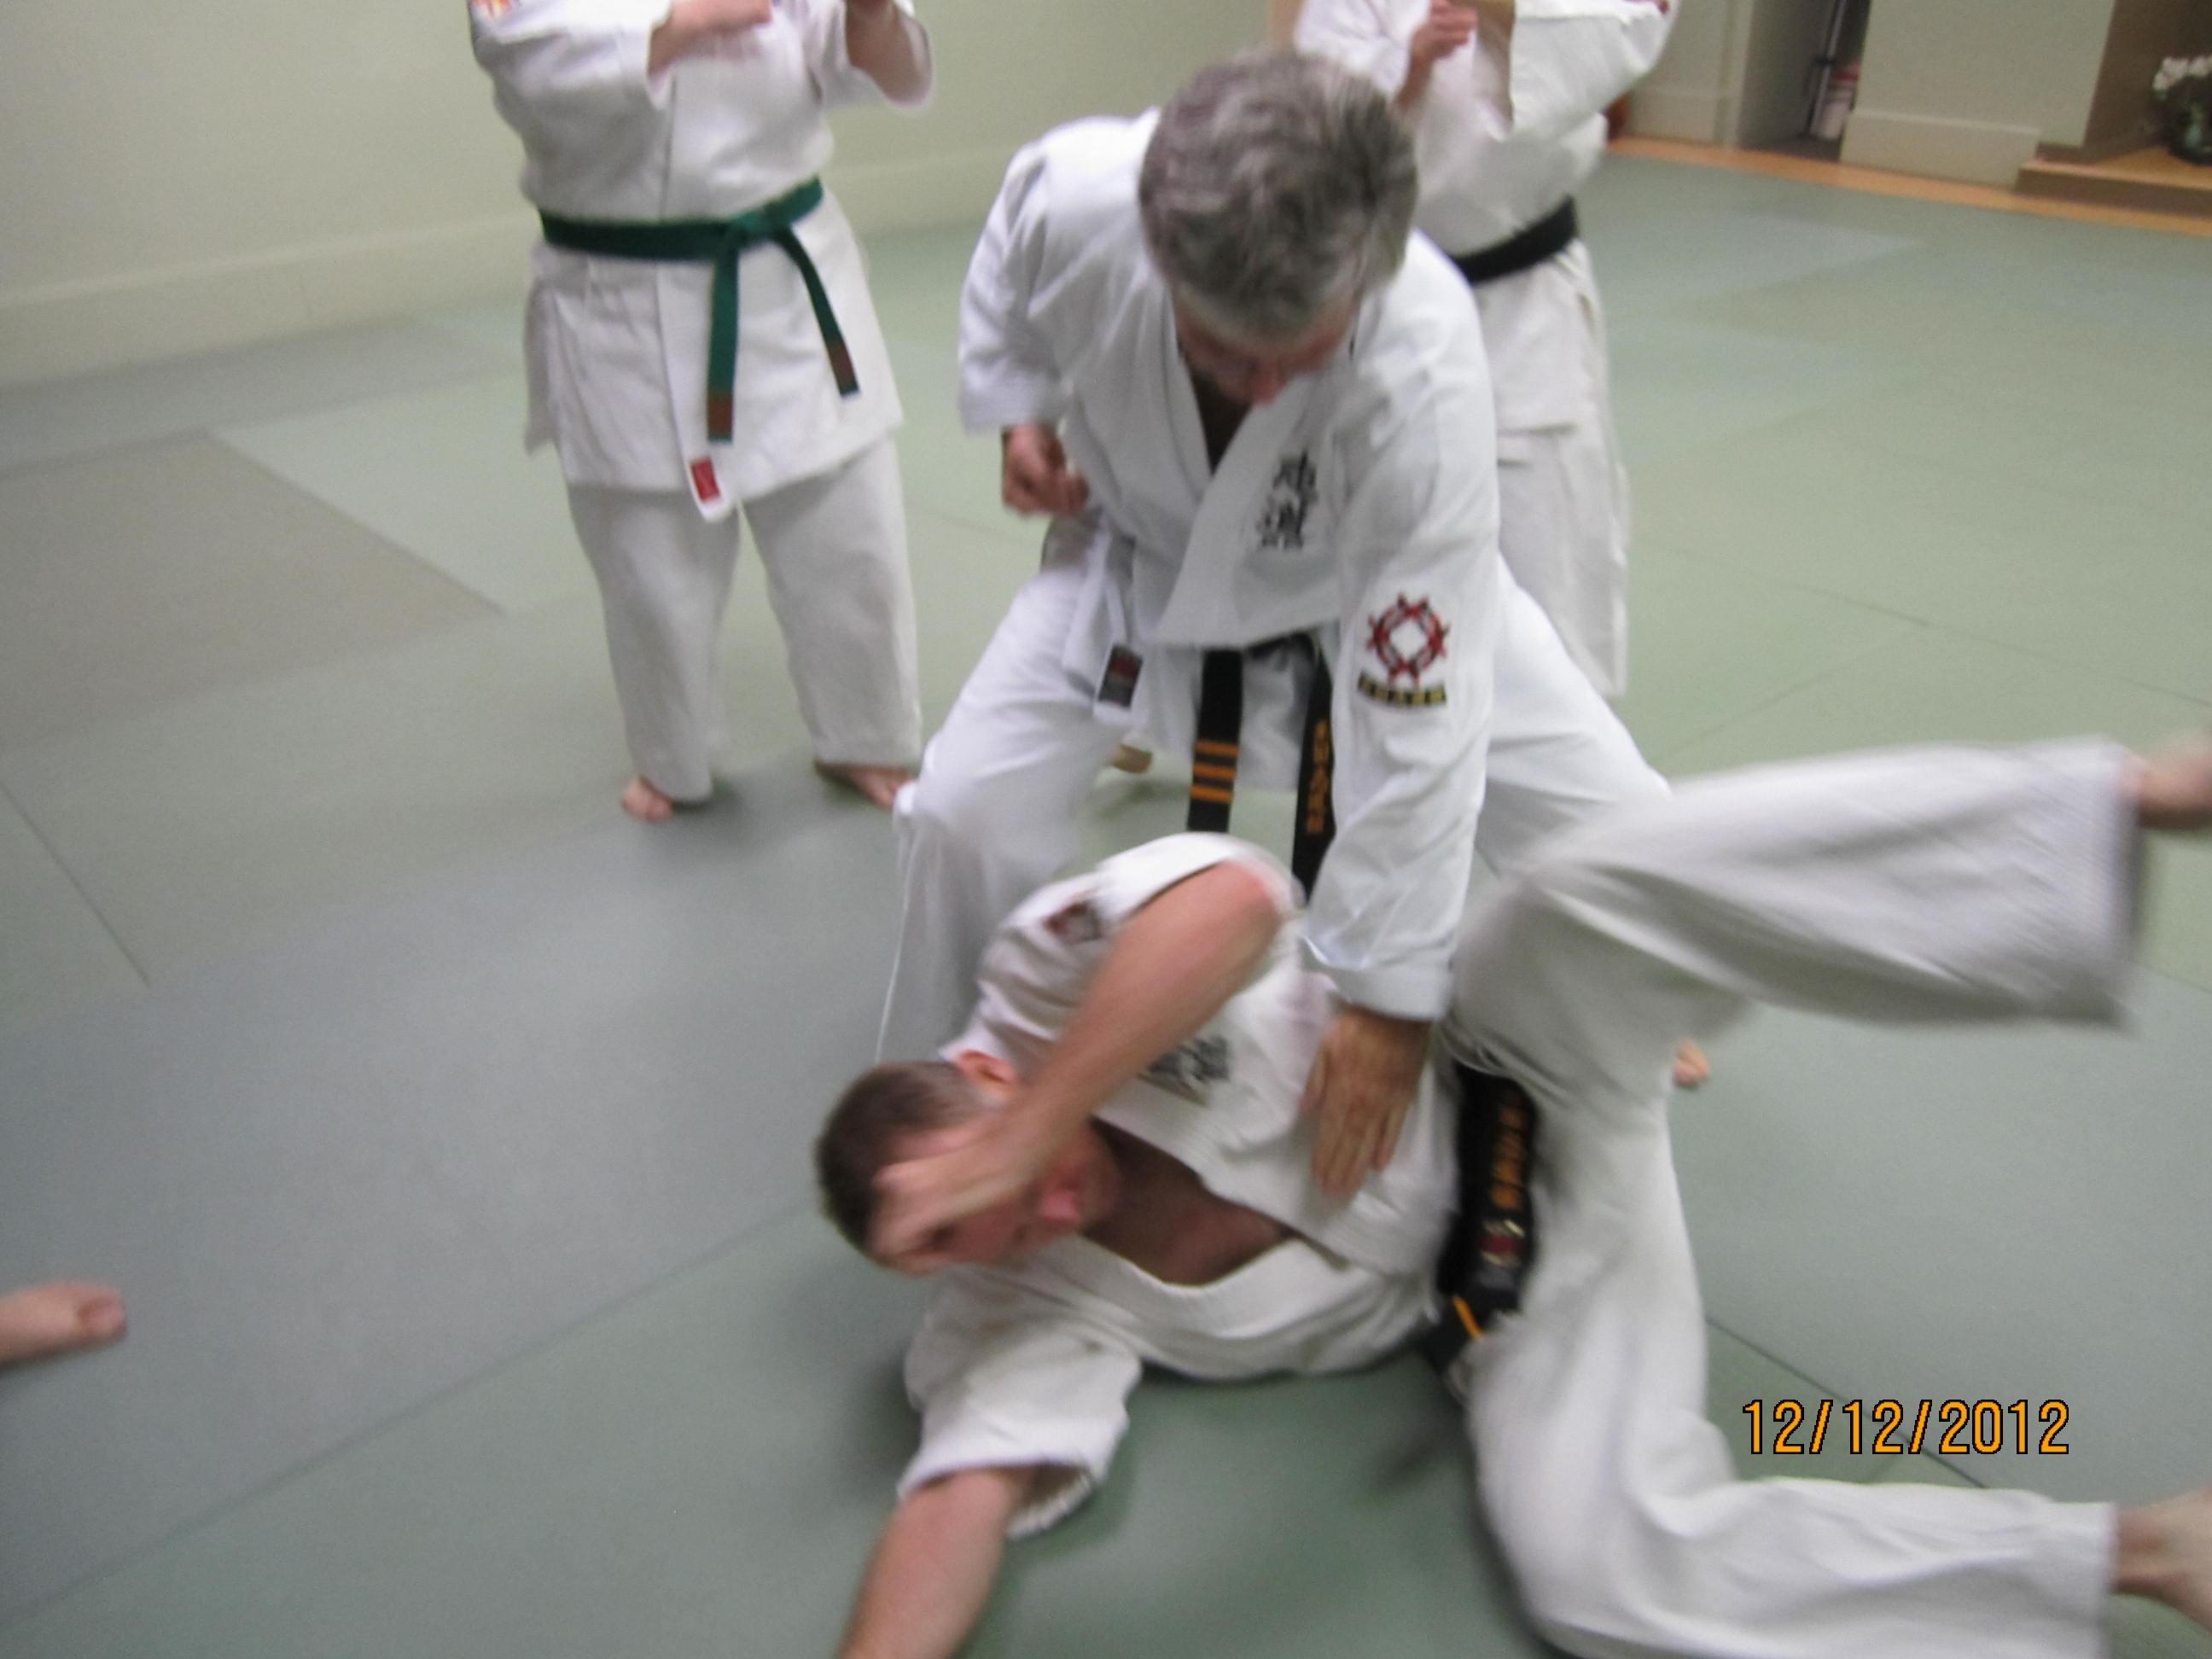 okinawan karate - Clawson, MI